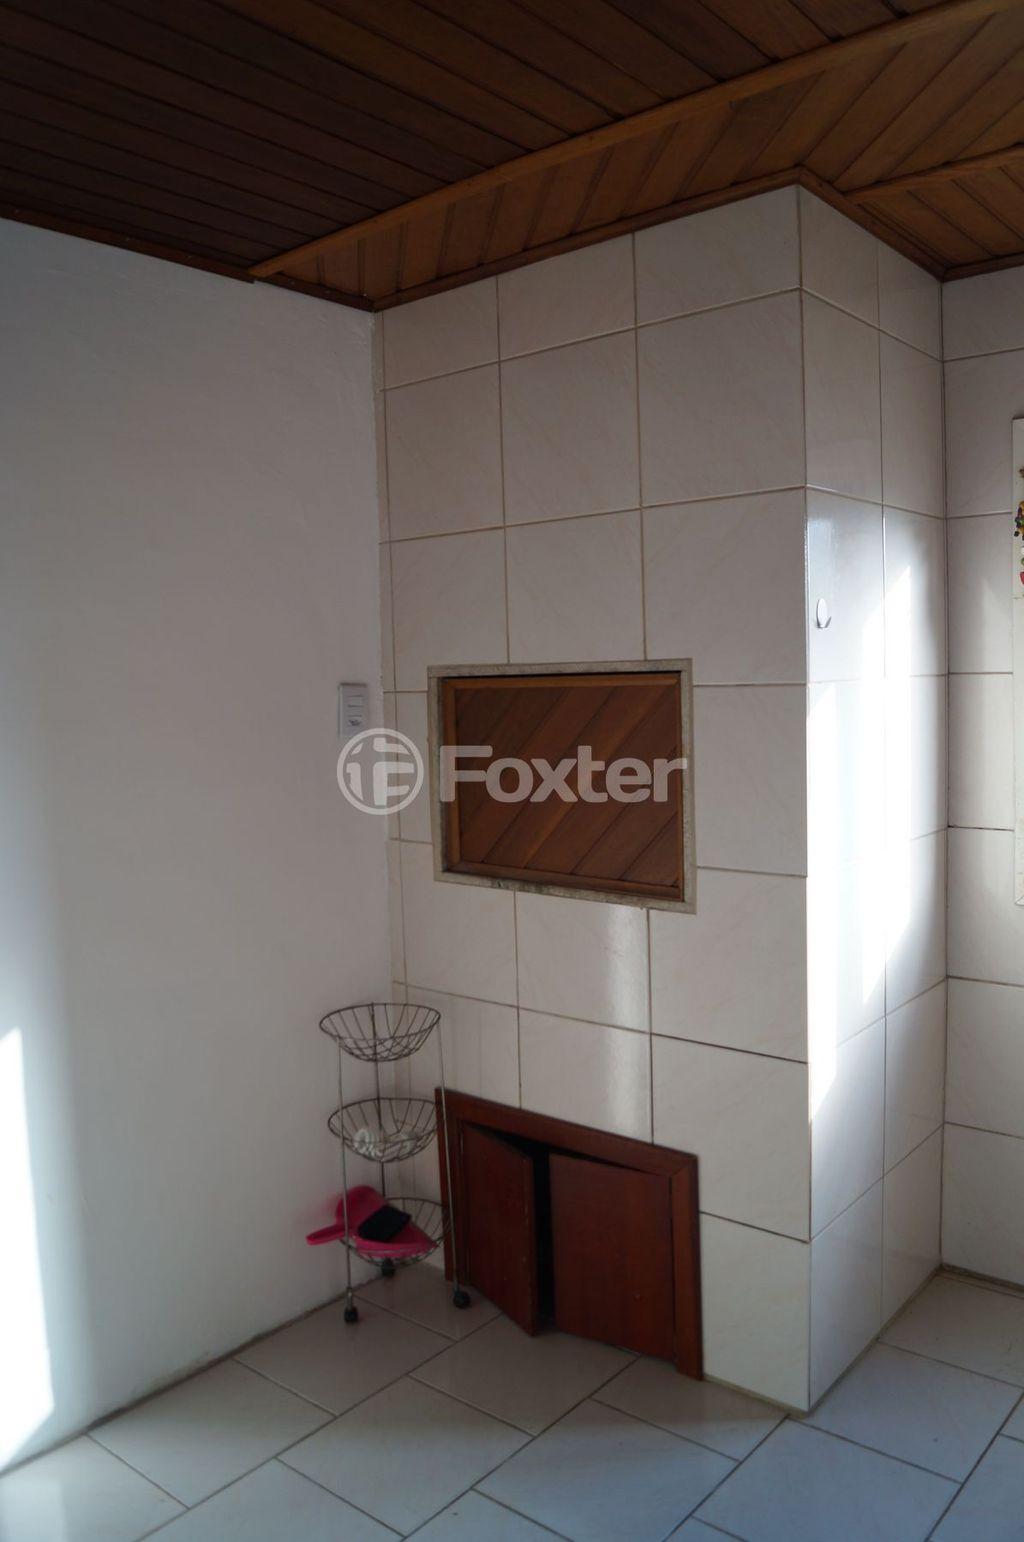 Cobertura 2 Dorm, Menino Deus, Porto Alegre (140040) - Foto 2